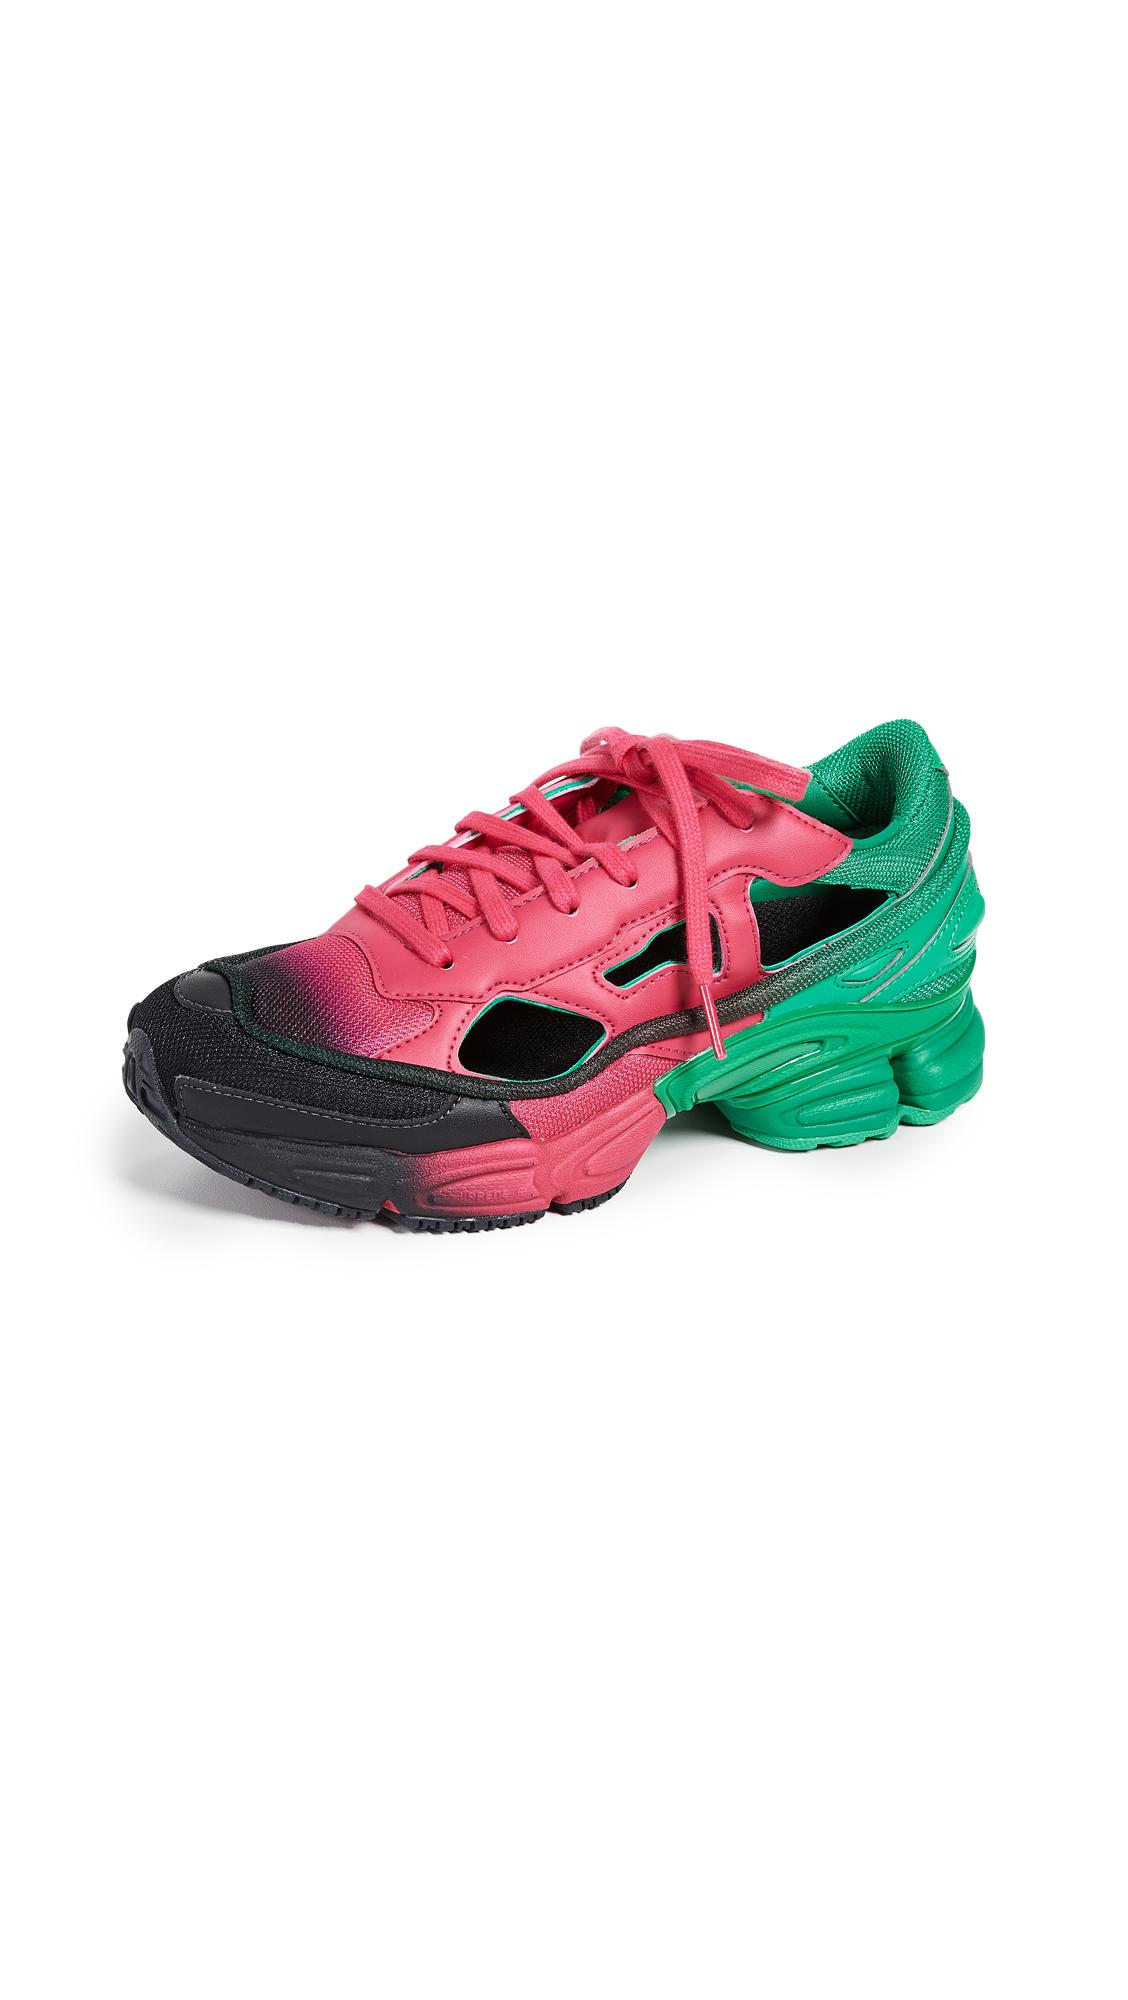 adidas x Raf Simons Replicant Ozweego Sneakers - Pink/Adidas Green/Core Black